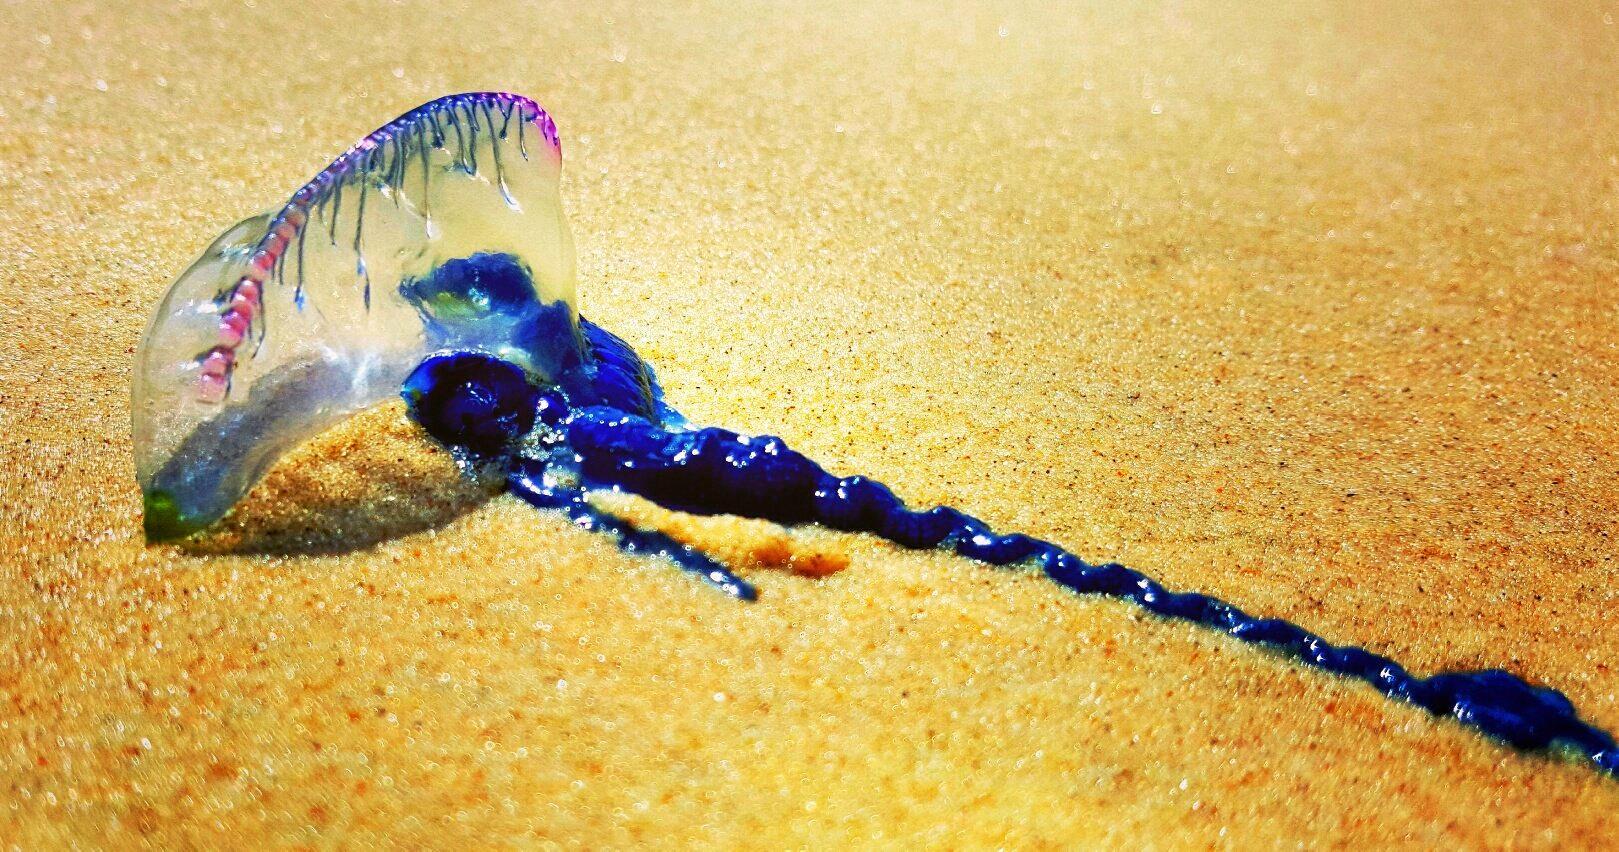 A boy has been stung by a bluebottle on a Coast beach.